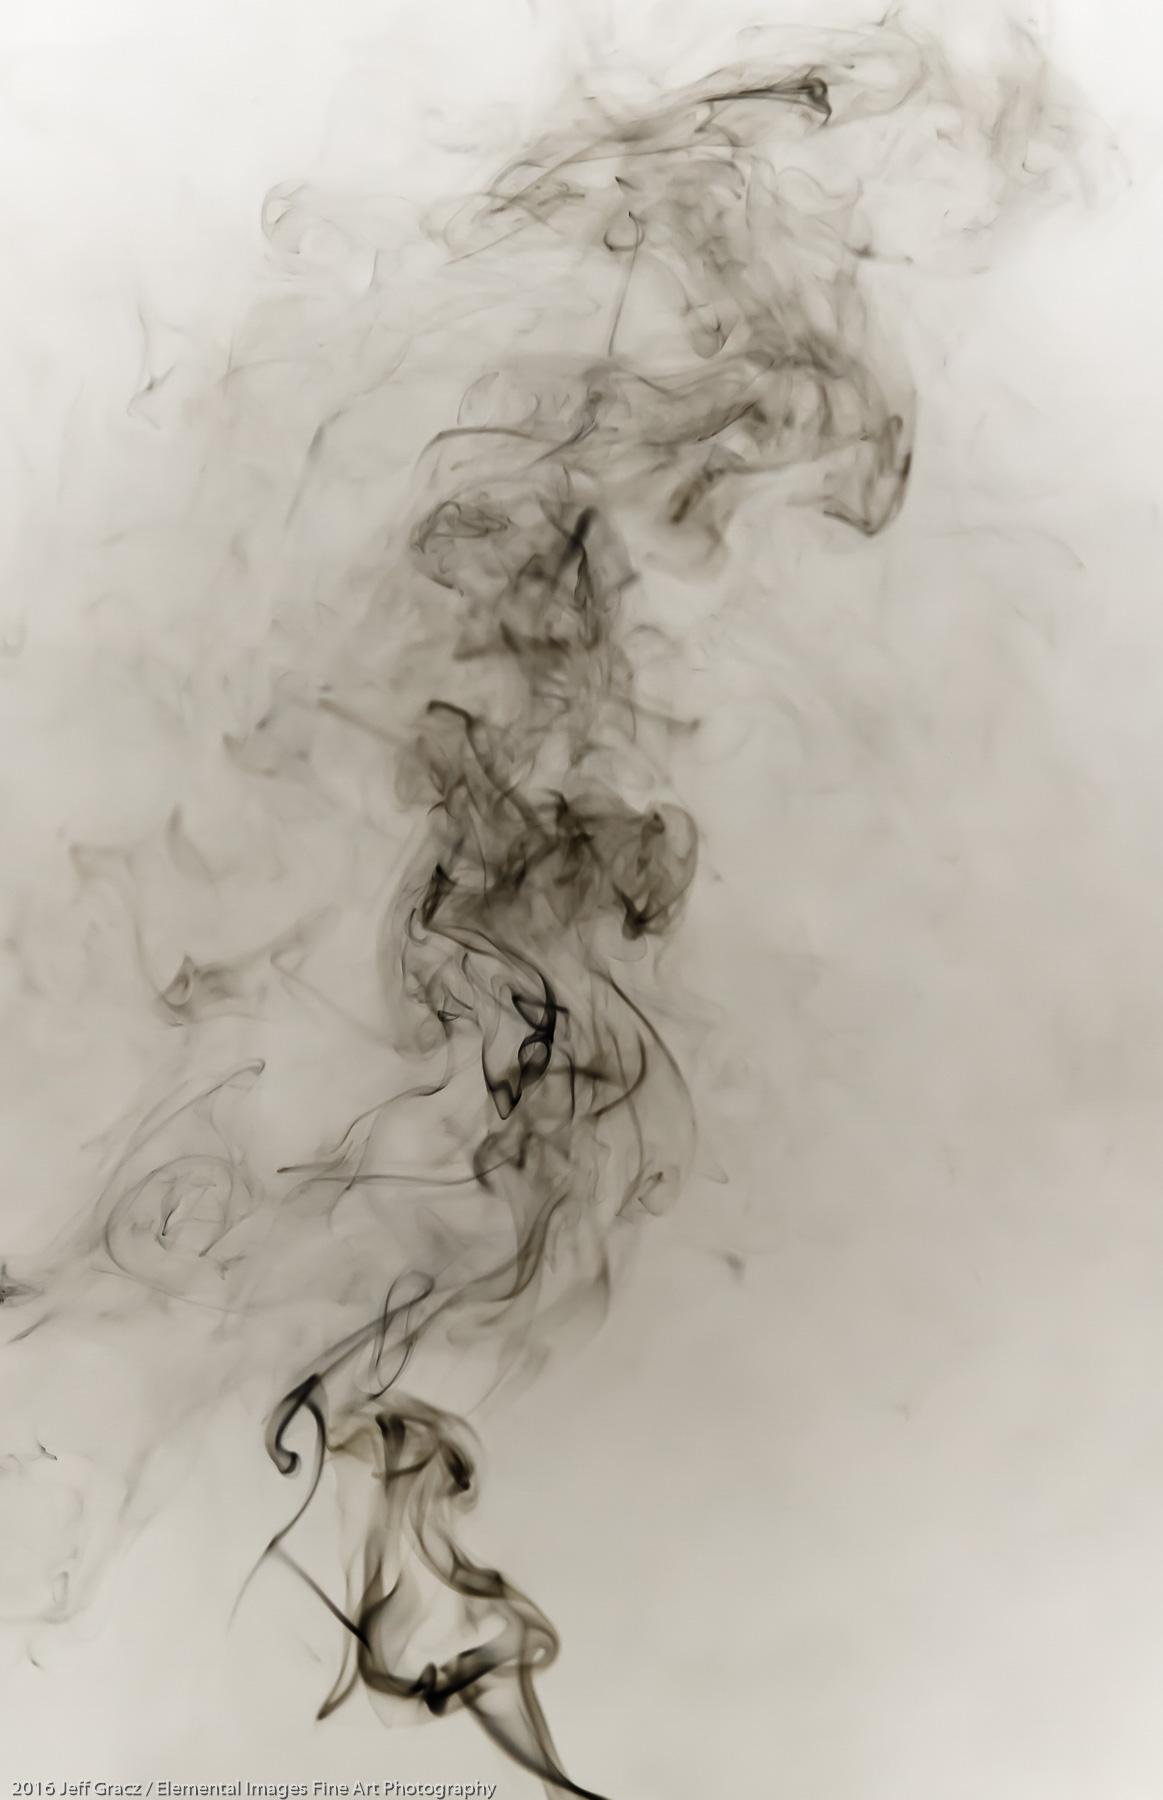 Smoke 29   Vancouver   WA   USA - © 2016 Jeff Gracz / Elemental Images Fine Art Photography - All Rights Reserved Worldwide